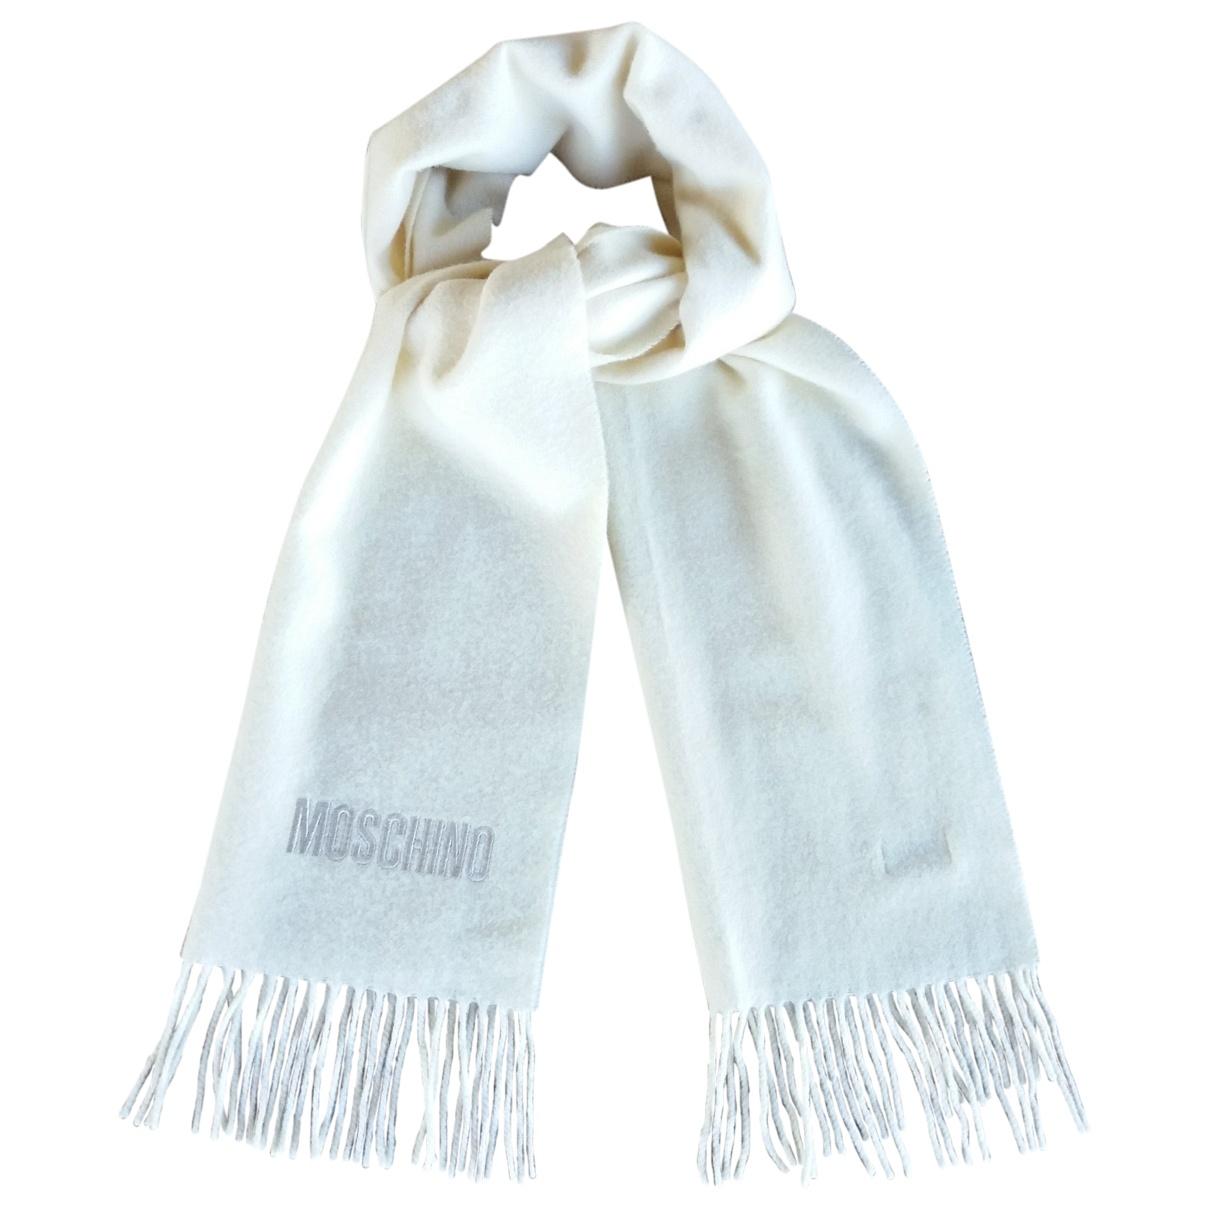 Moschino - Foulard   pour femme en laine - beige